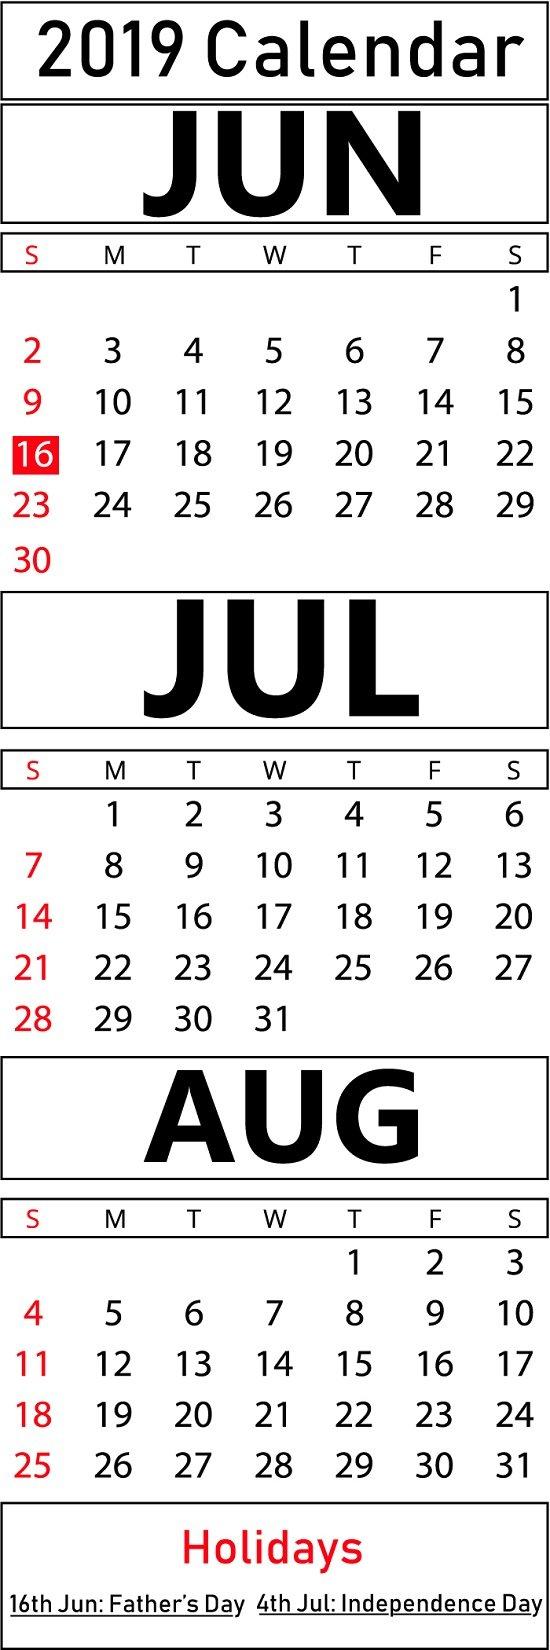 Printable June & July & August 2019 Calendar Templates   Printable June 7 2019 Calendar